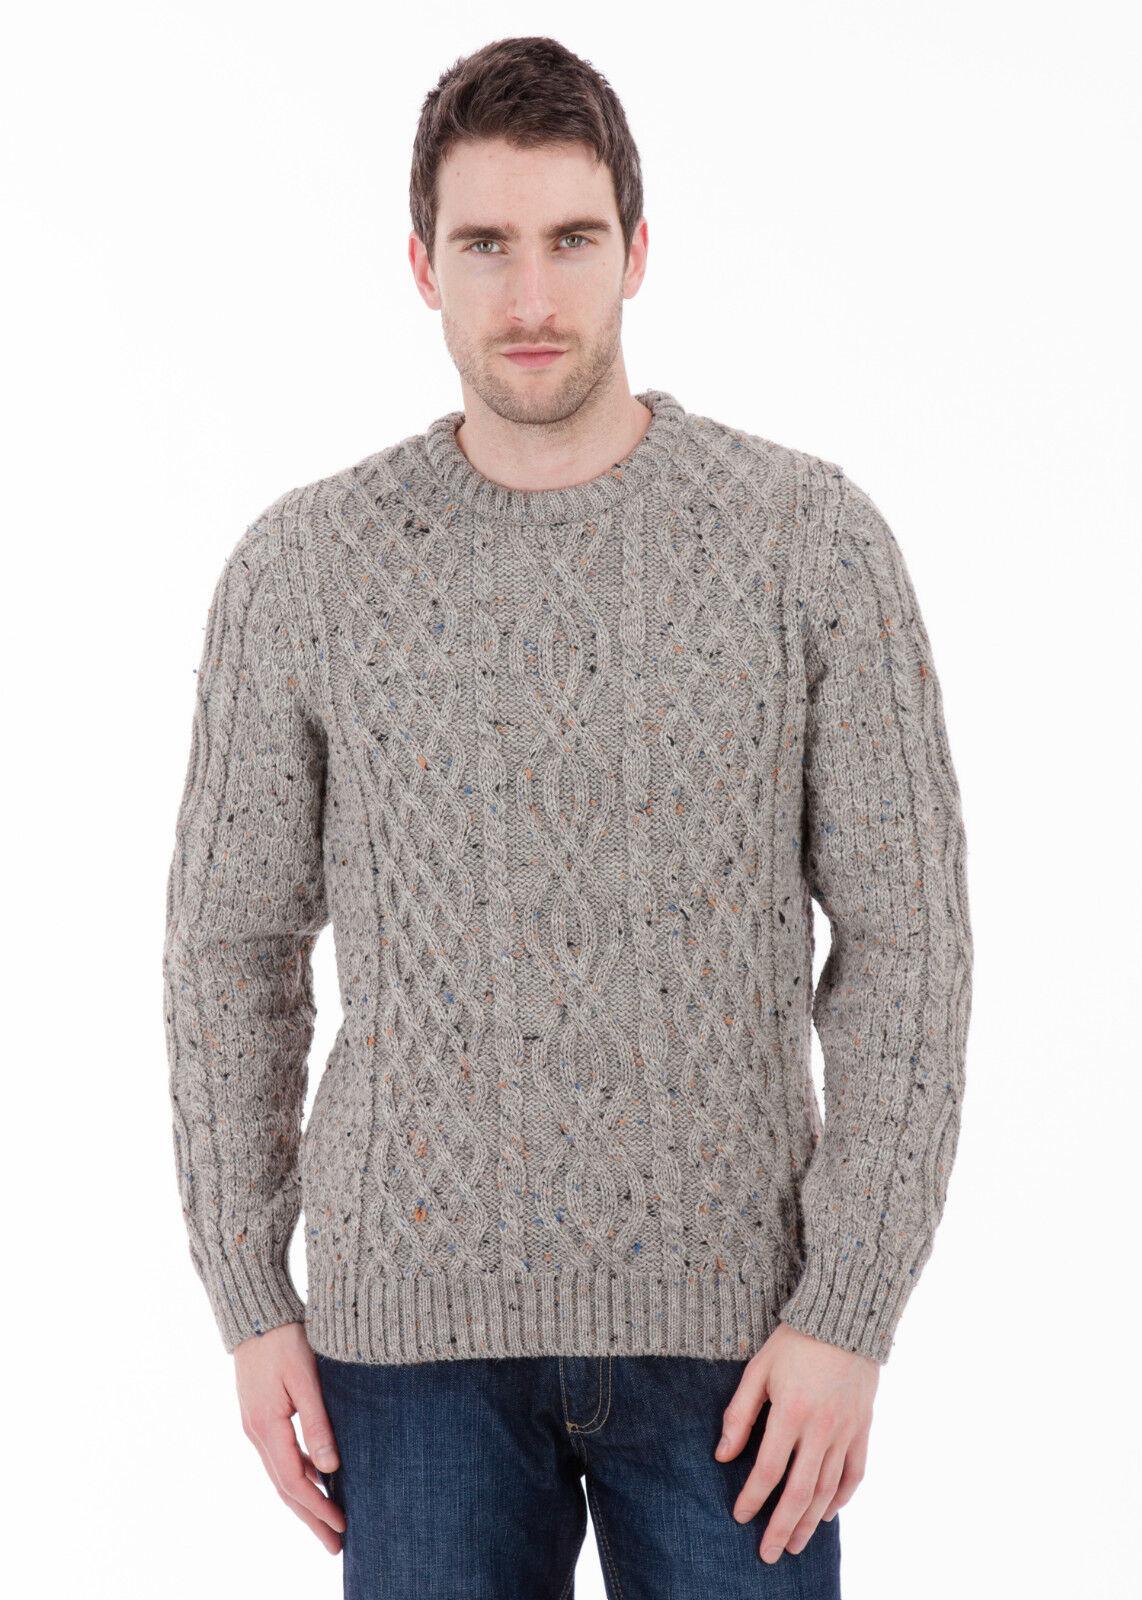 Jarvis - 100% British Wool -   Herren Nepp Aran Jumper Sweater - Made in the UK